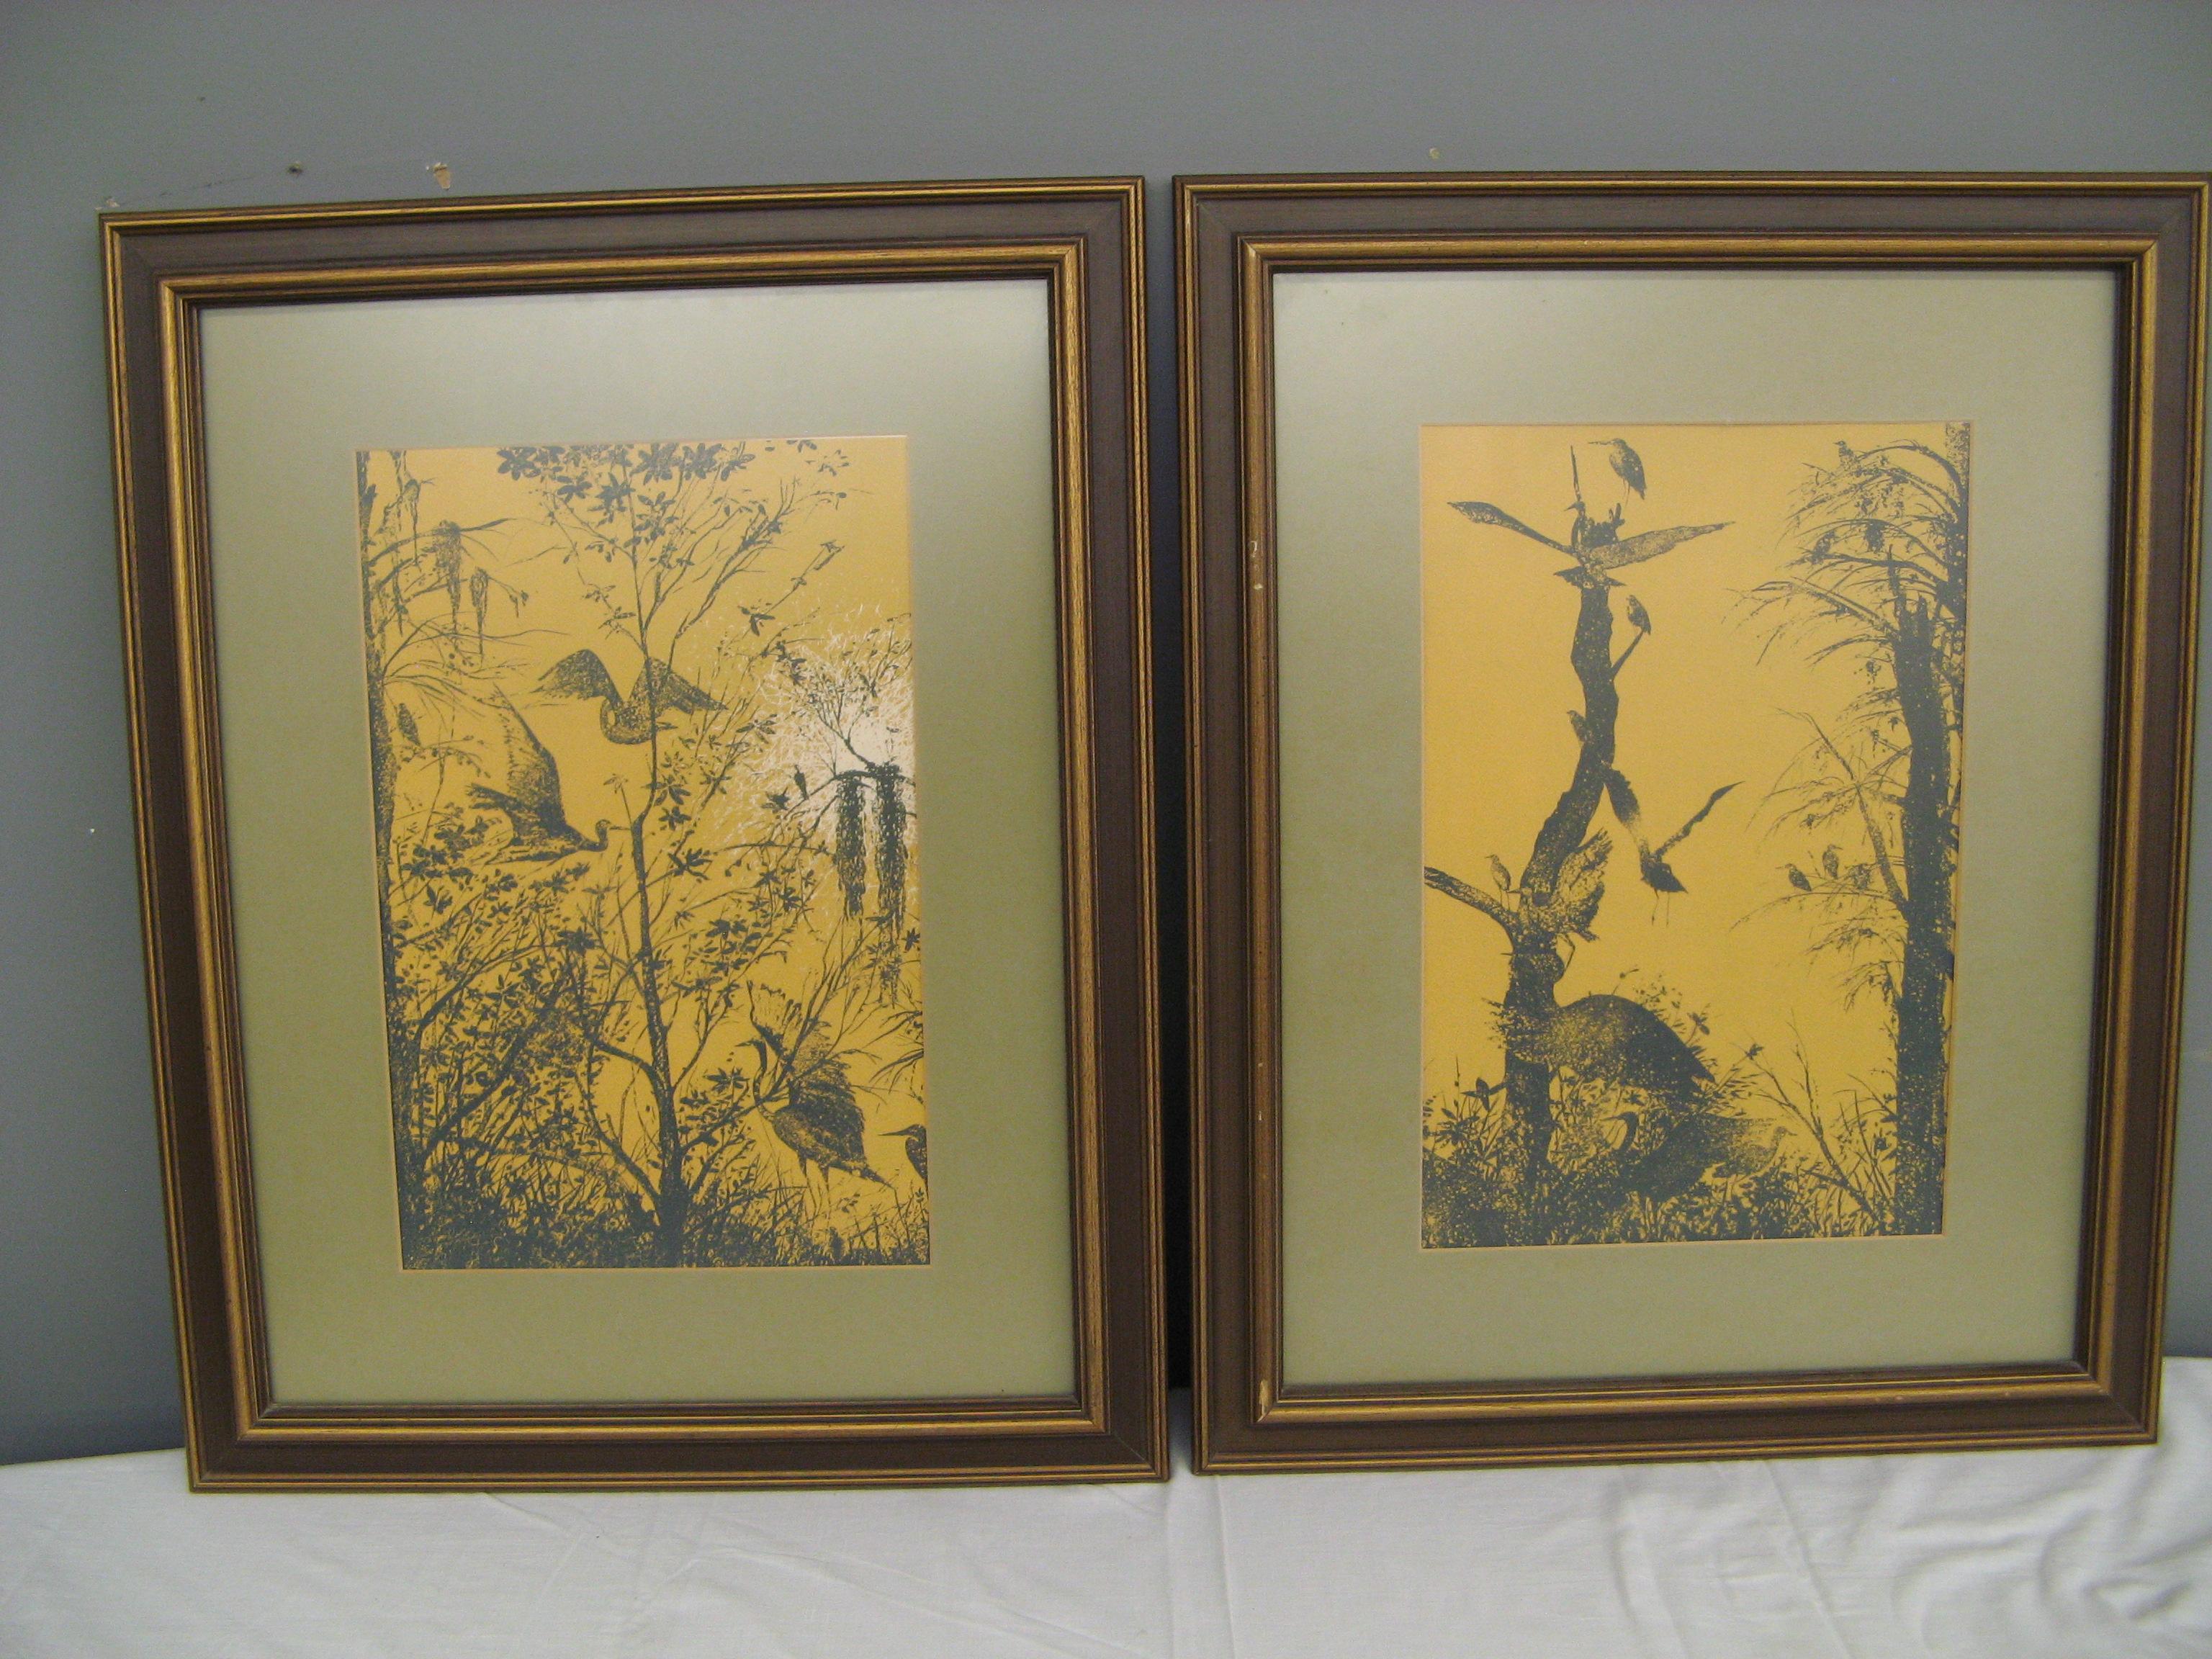 Pair of Prints By Rosario Guajardo of Mexico (1979)